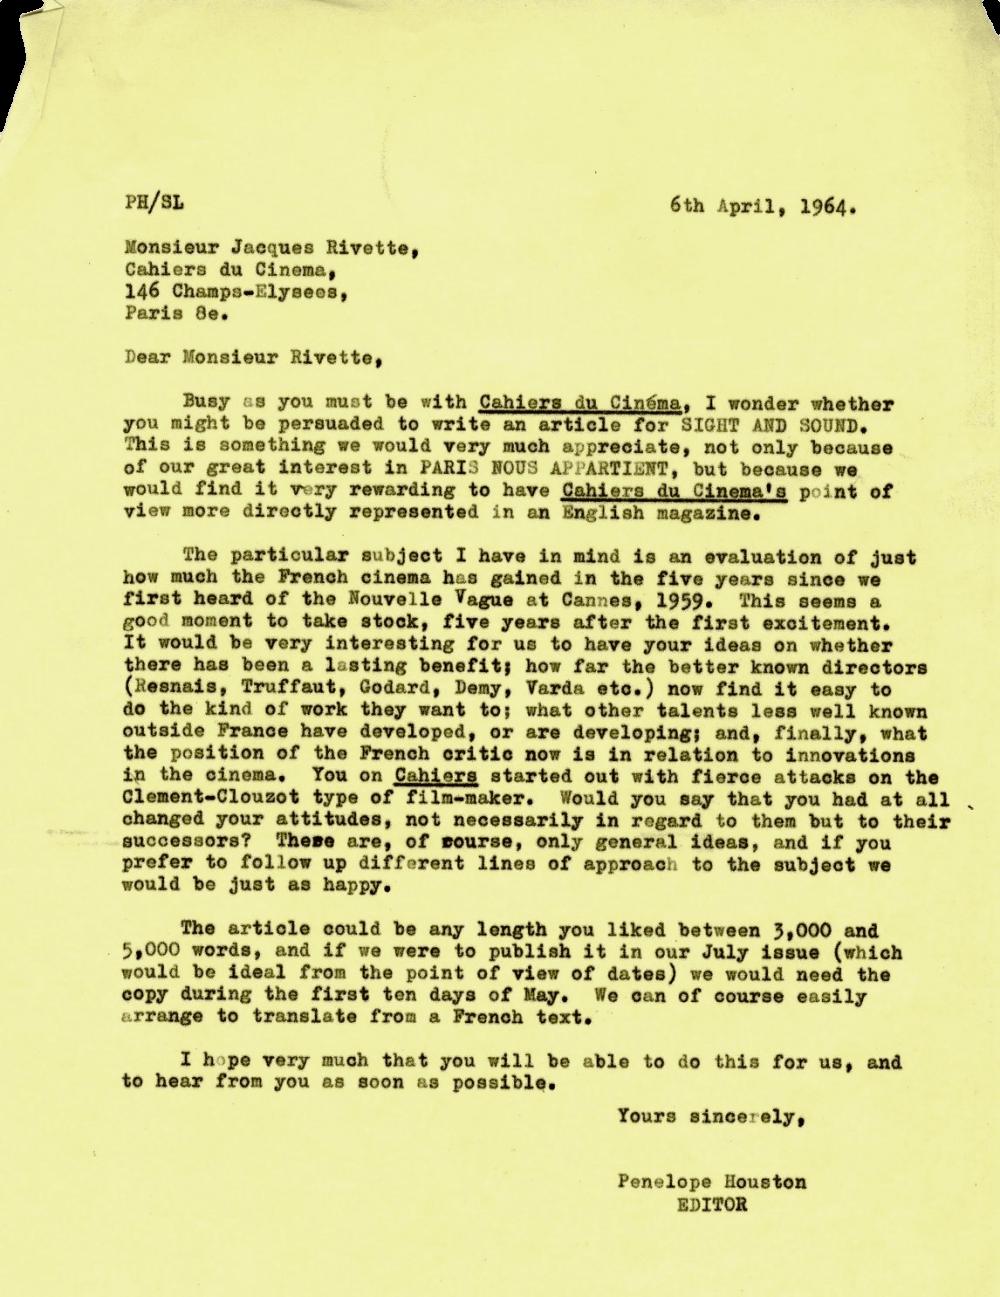 Dear Monsieur Rivette… an invitation to write for Sight